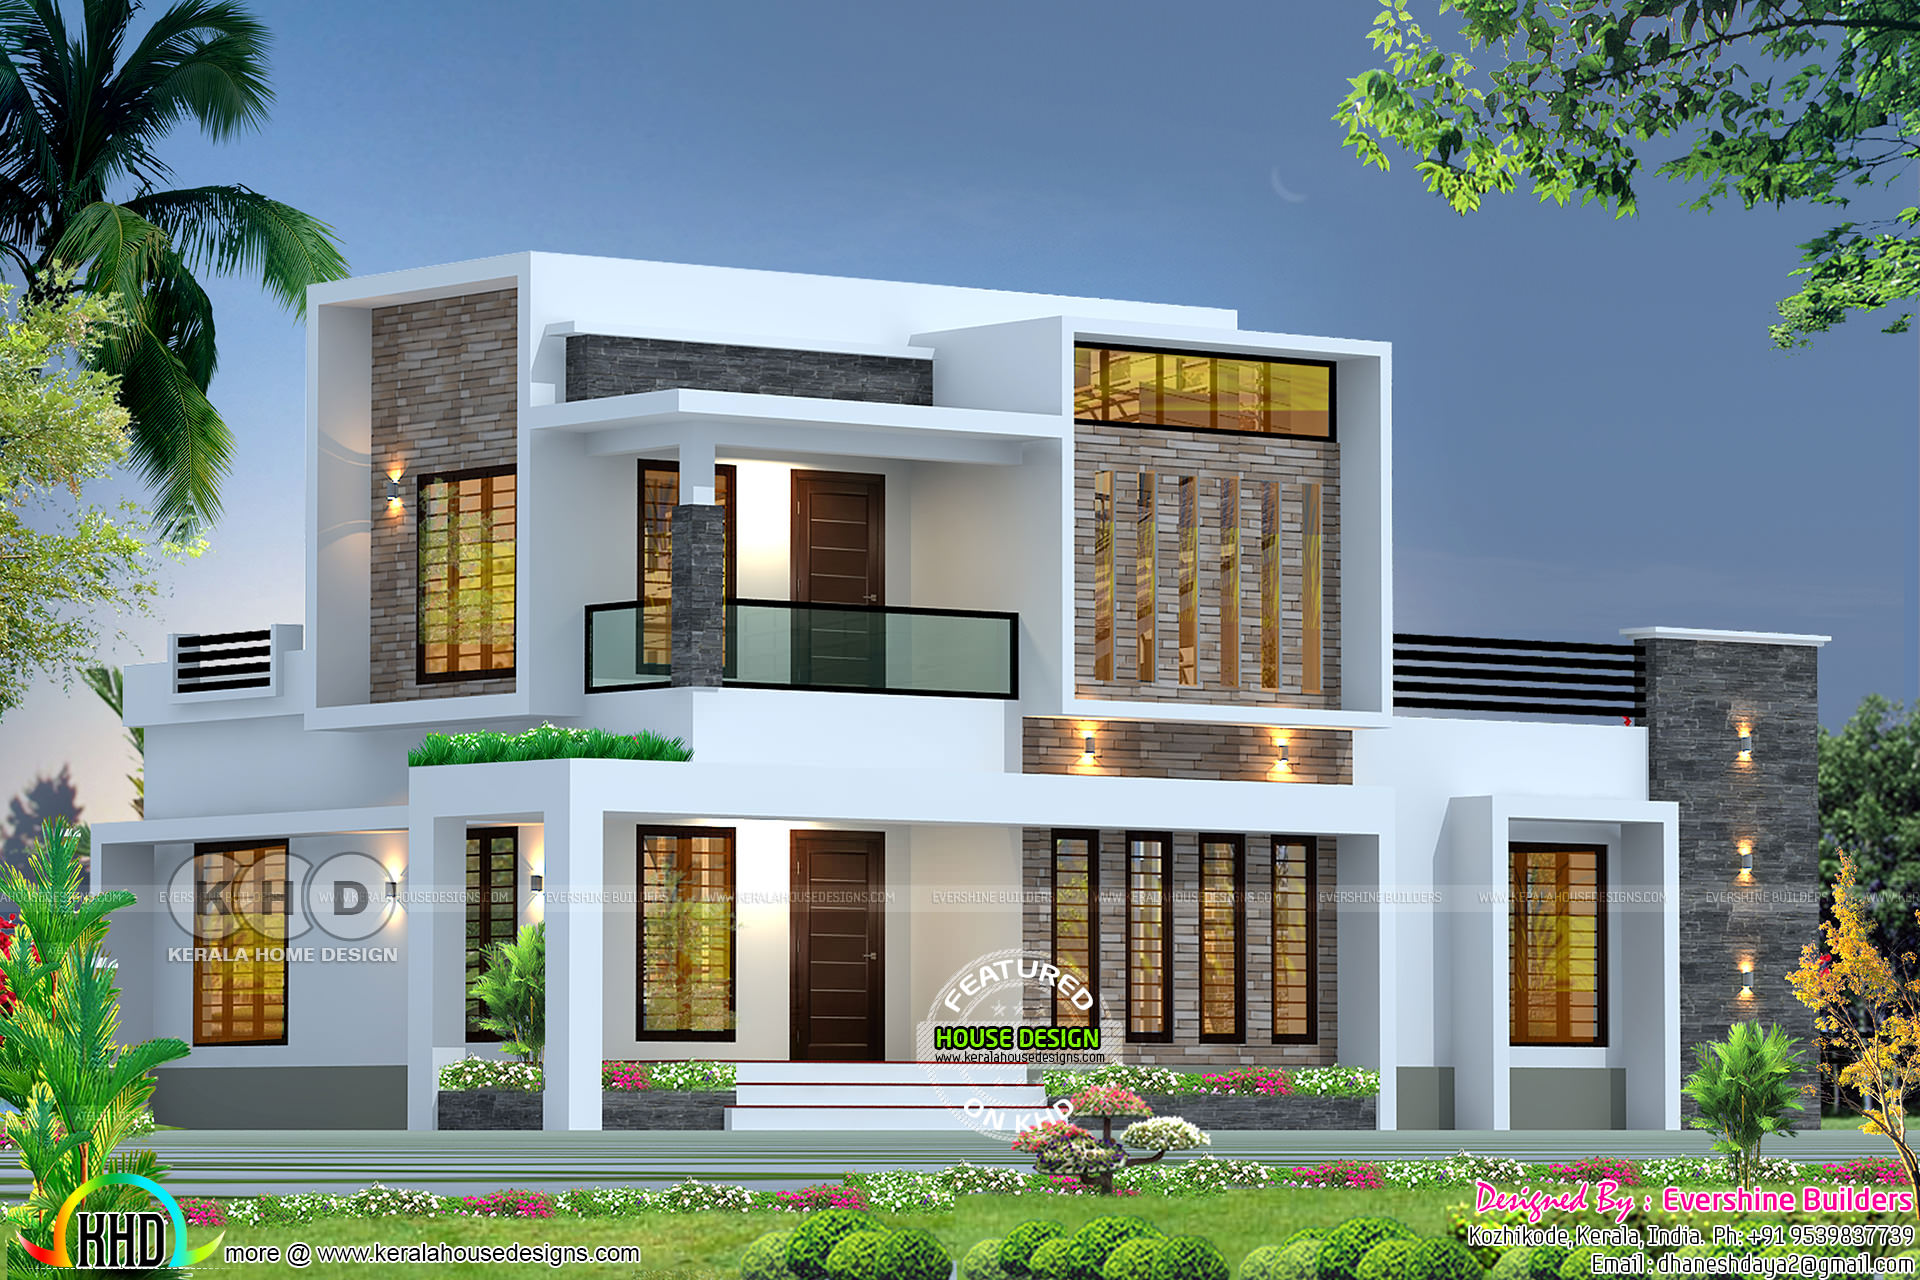 Box Model Modern 2200 Square Feet House Kerala Home